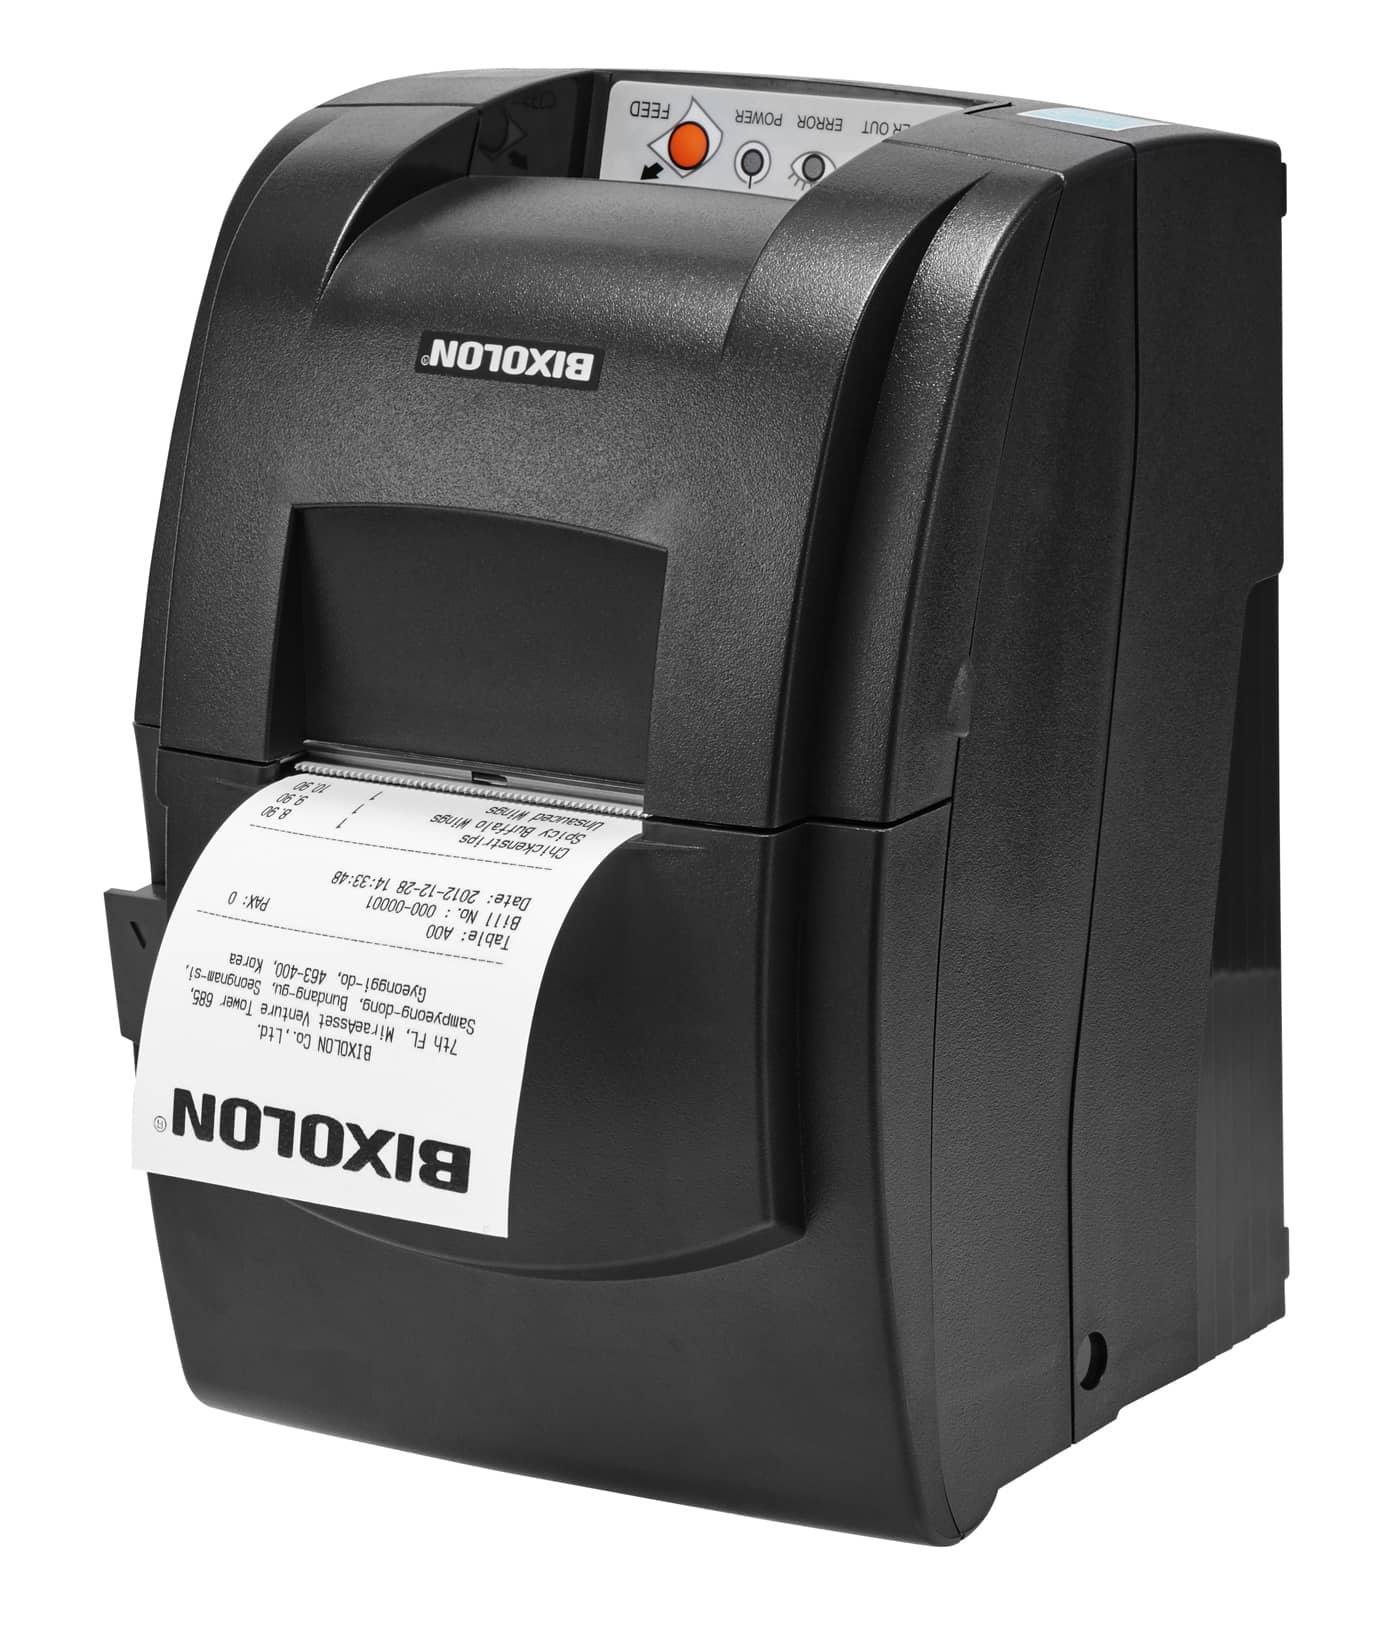 Bixolon SRP-275IIICOPG Dot Matrix Receipt Printer - USB/Parallel, Black